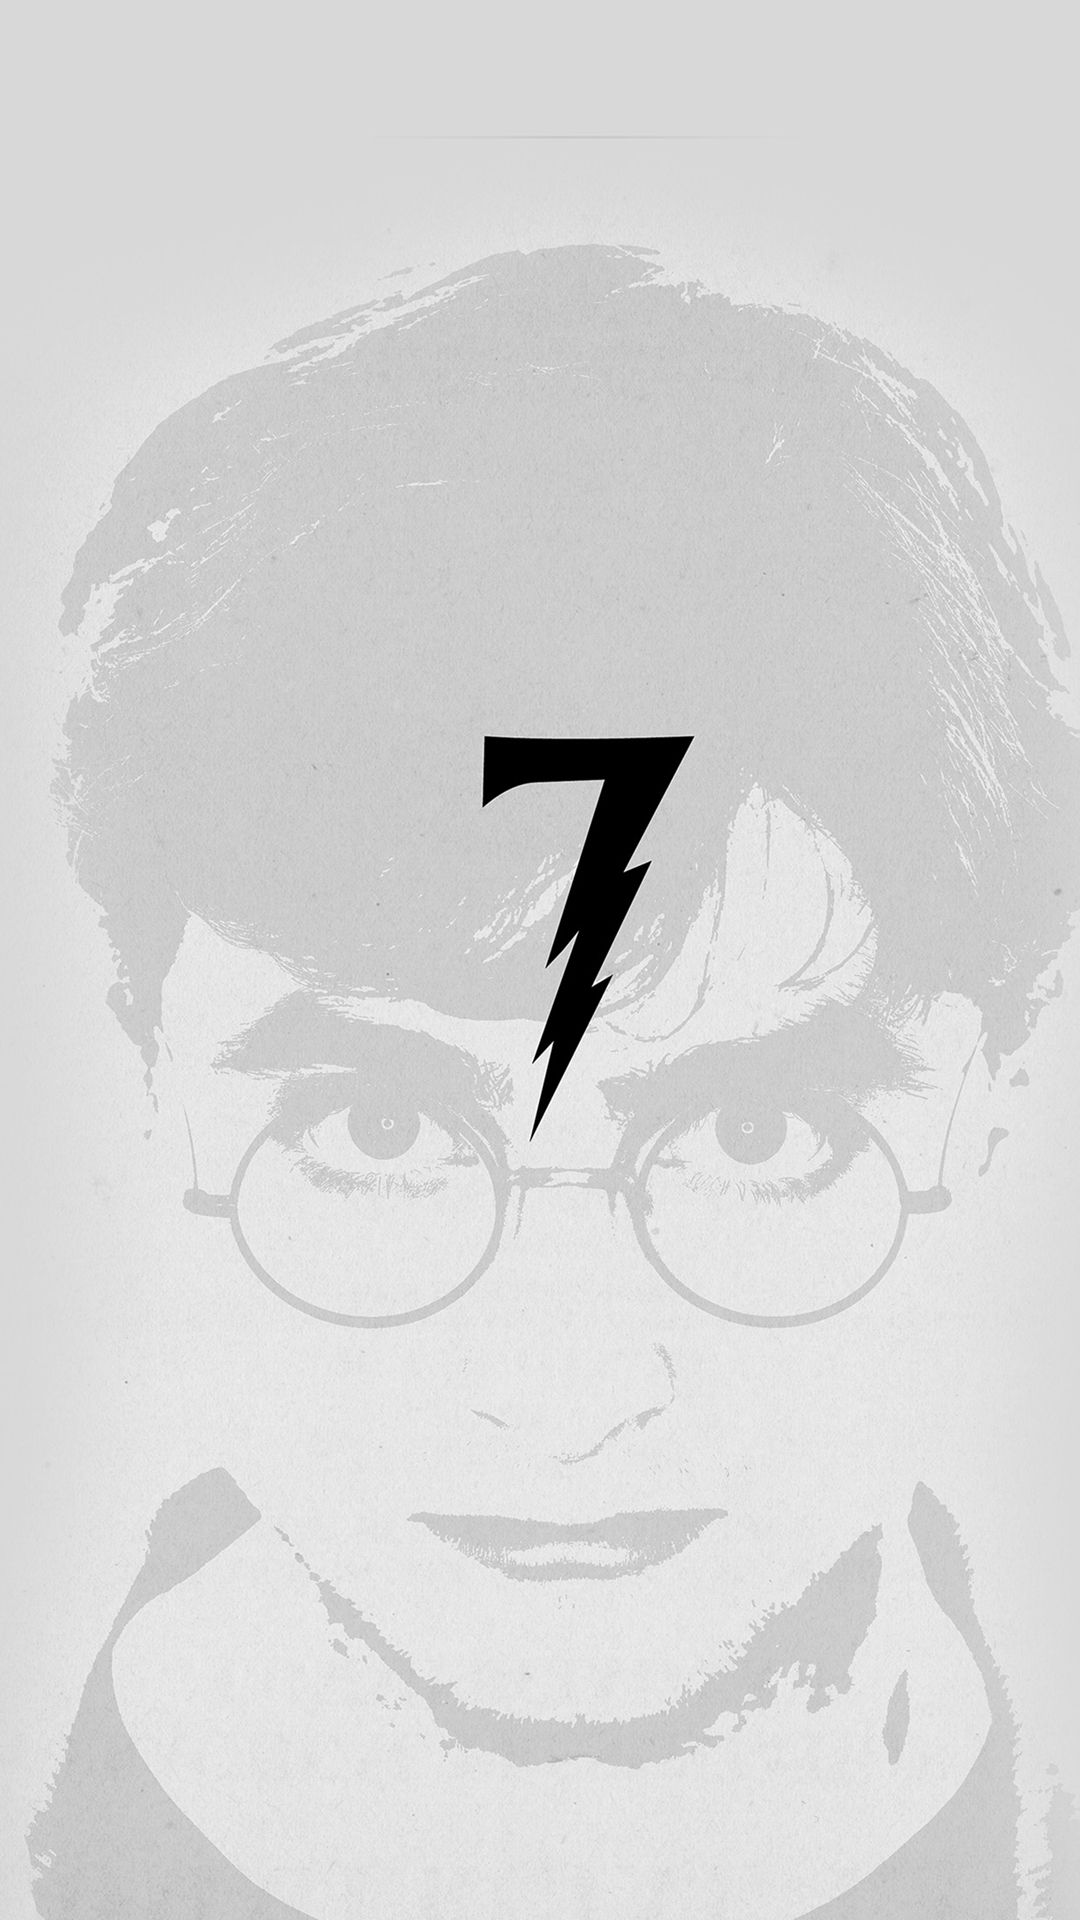 Most Inspiring Wallpaper Harry Potter Ipad - b8957b91f4889e71024d394f86e89182  Graphic_619510.jpg